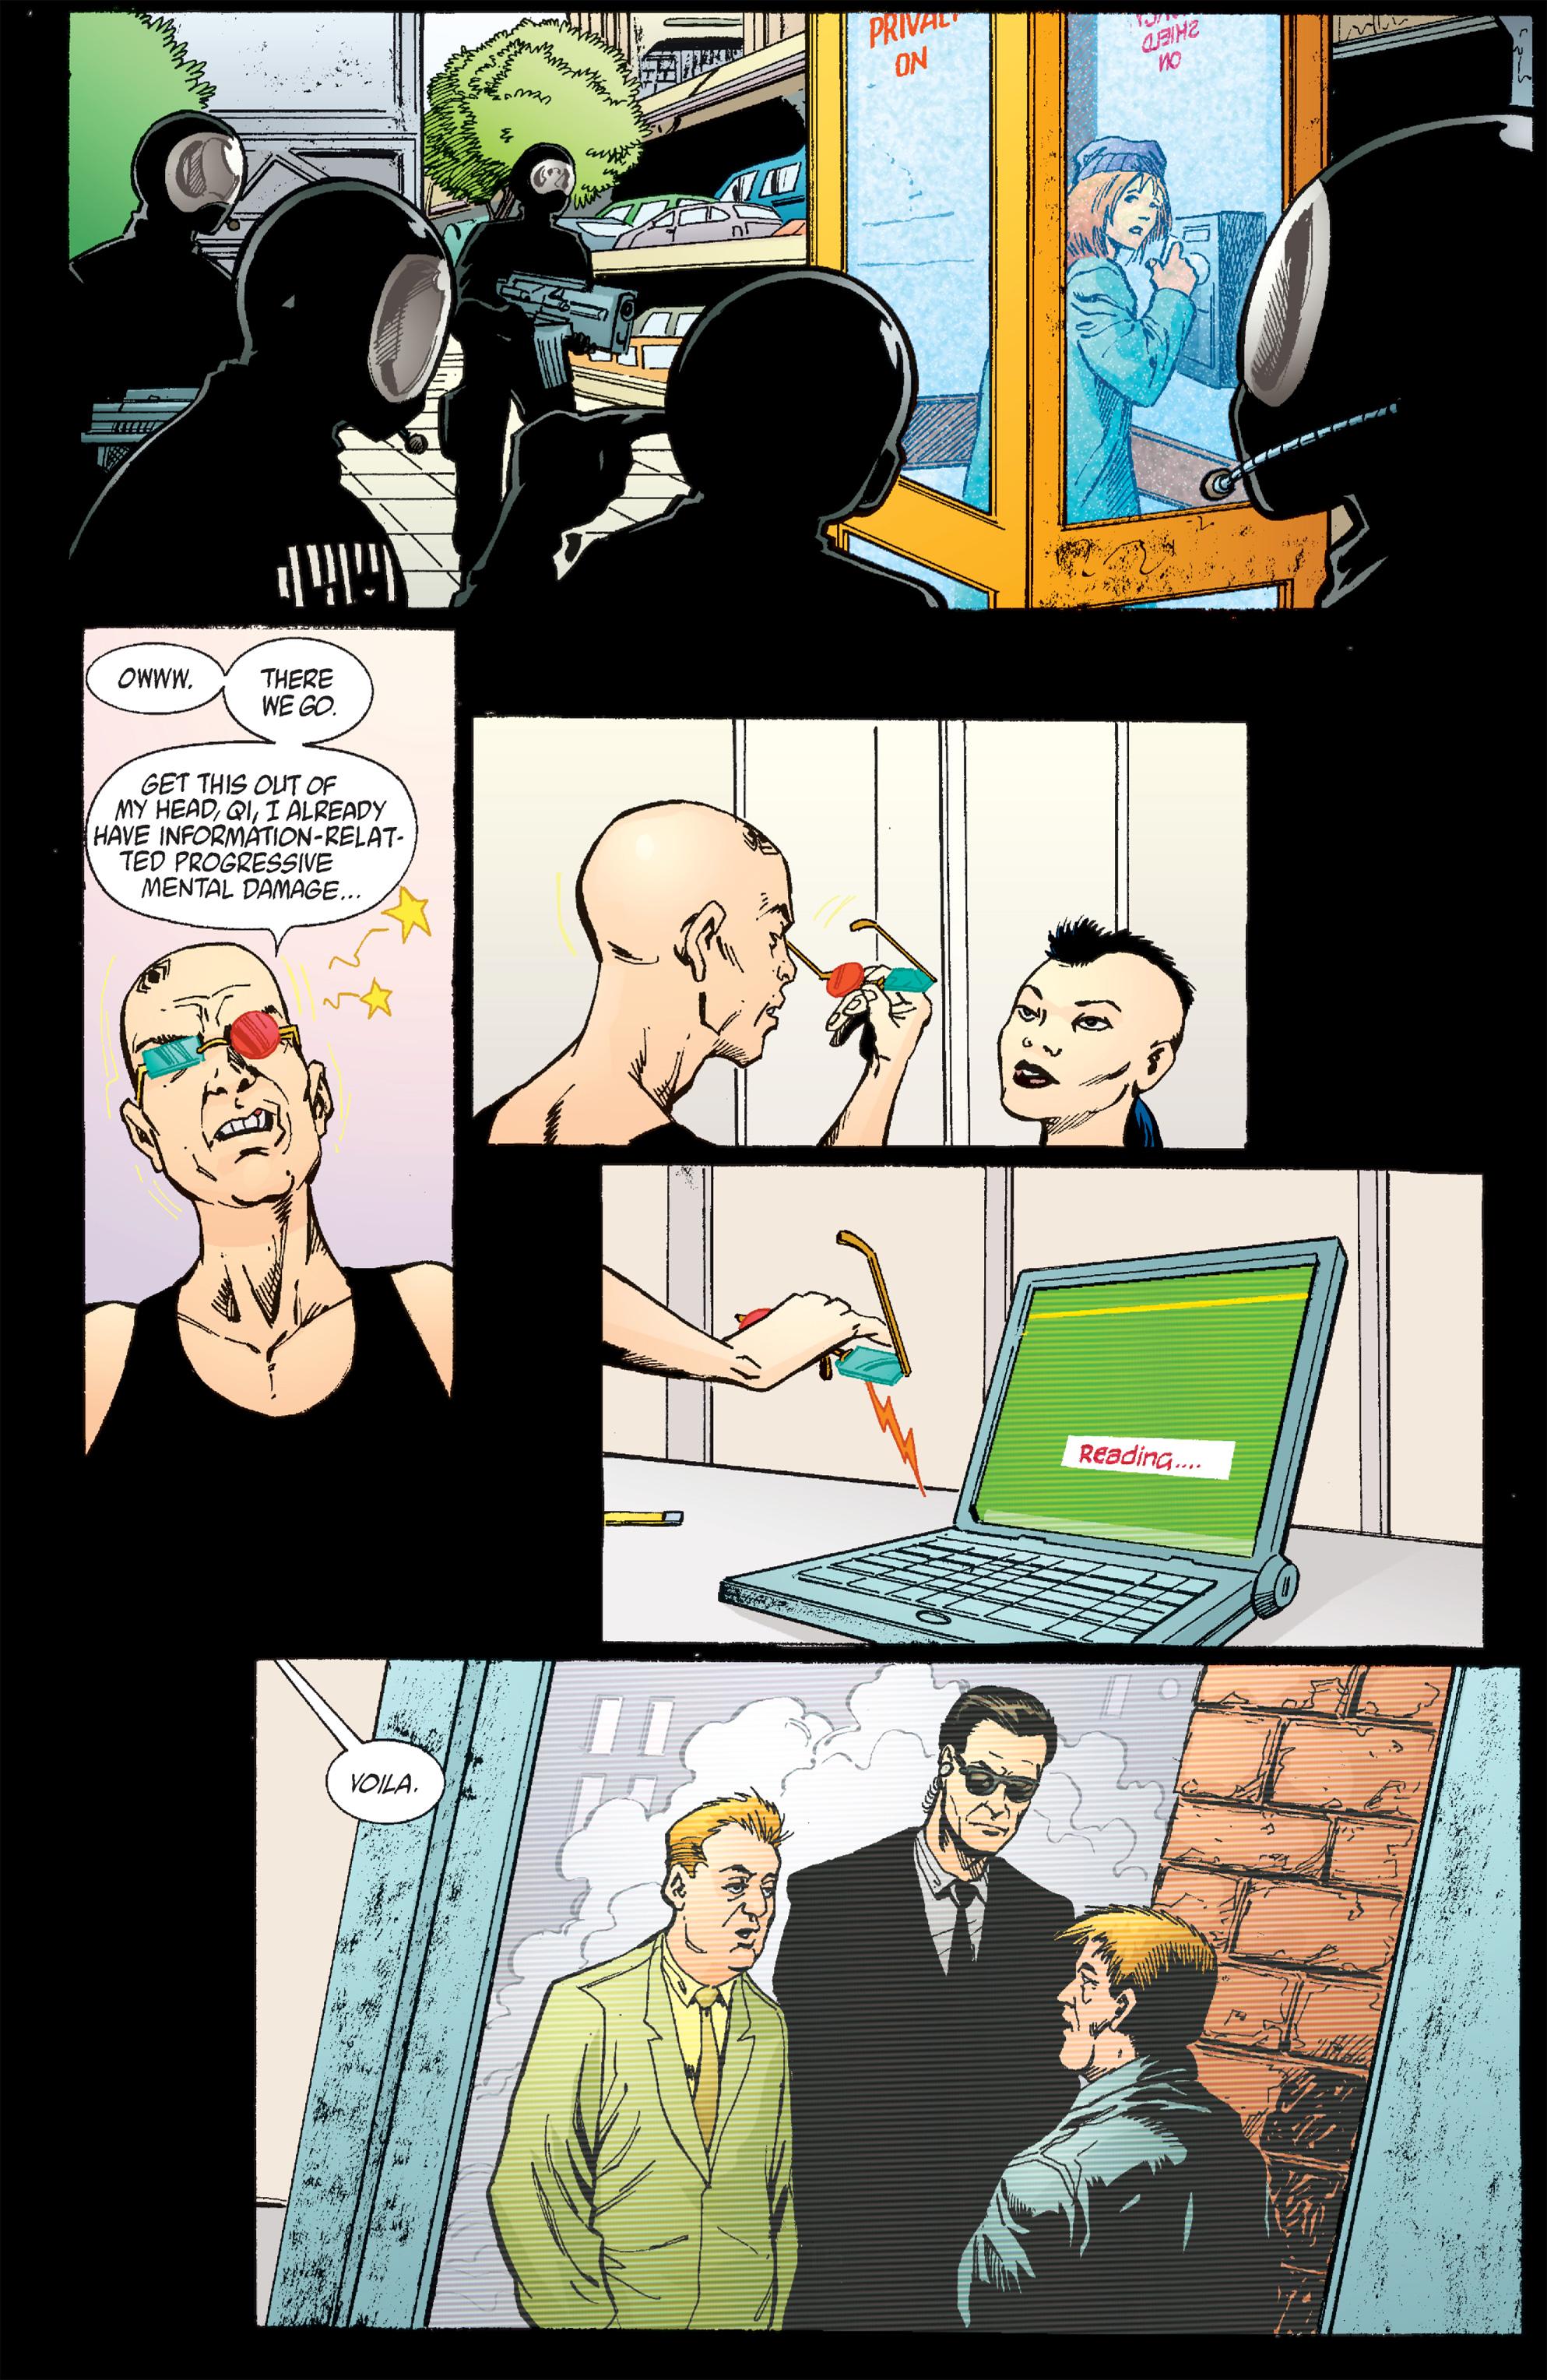 Read online Transmetropolitan comic -  Issue #57 - 16